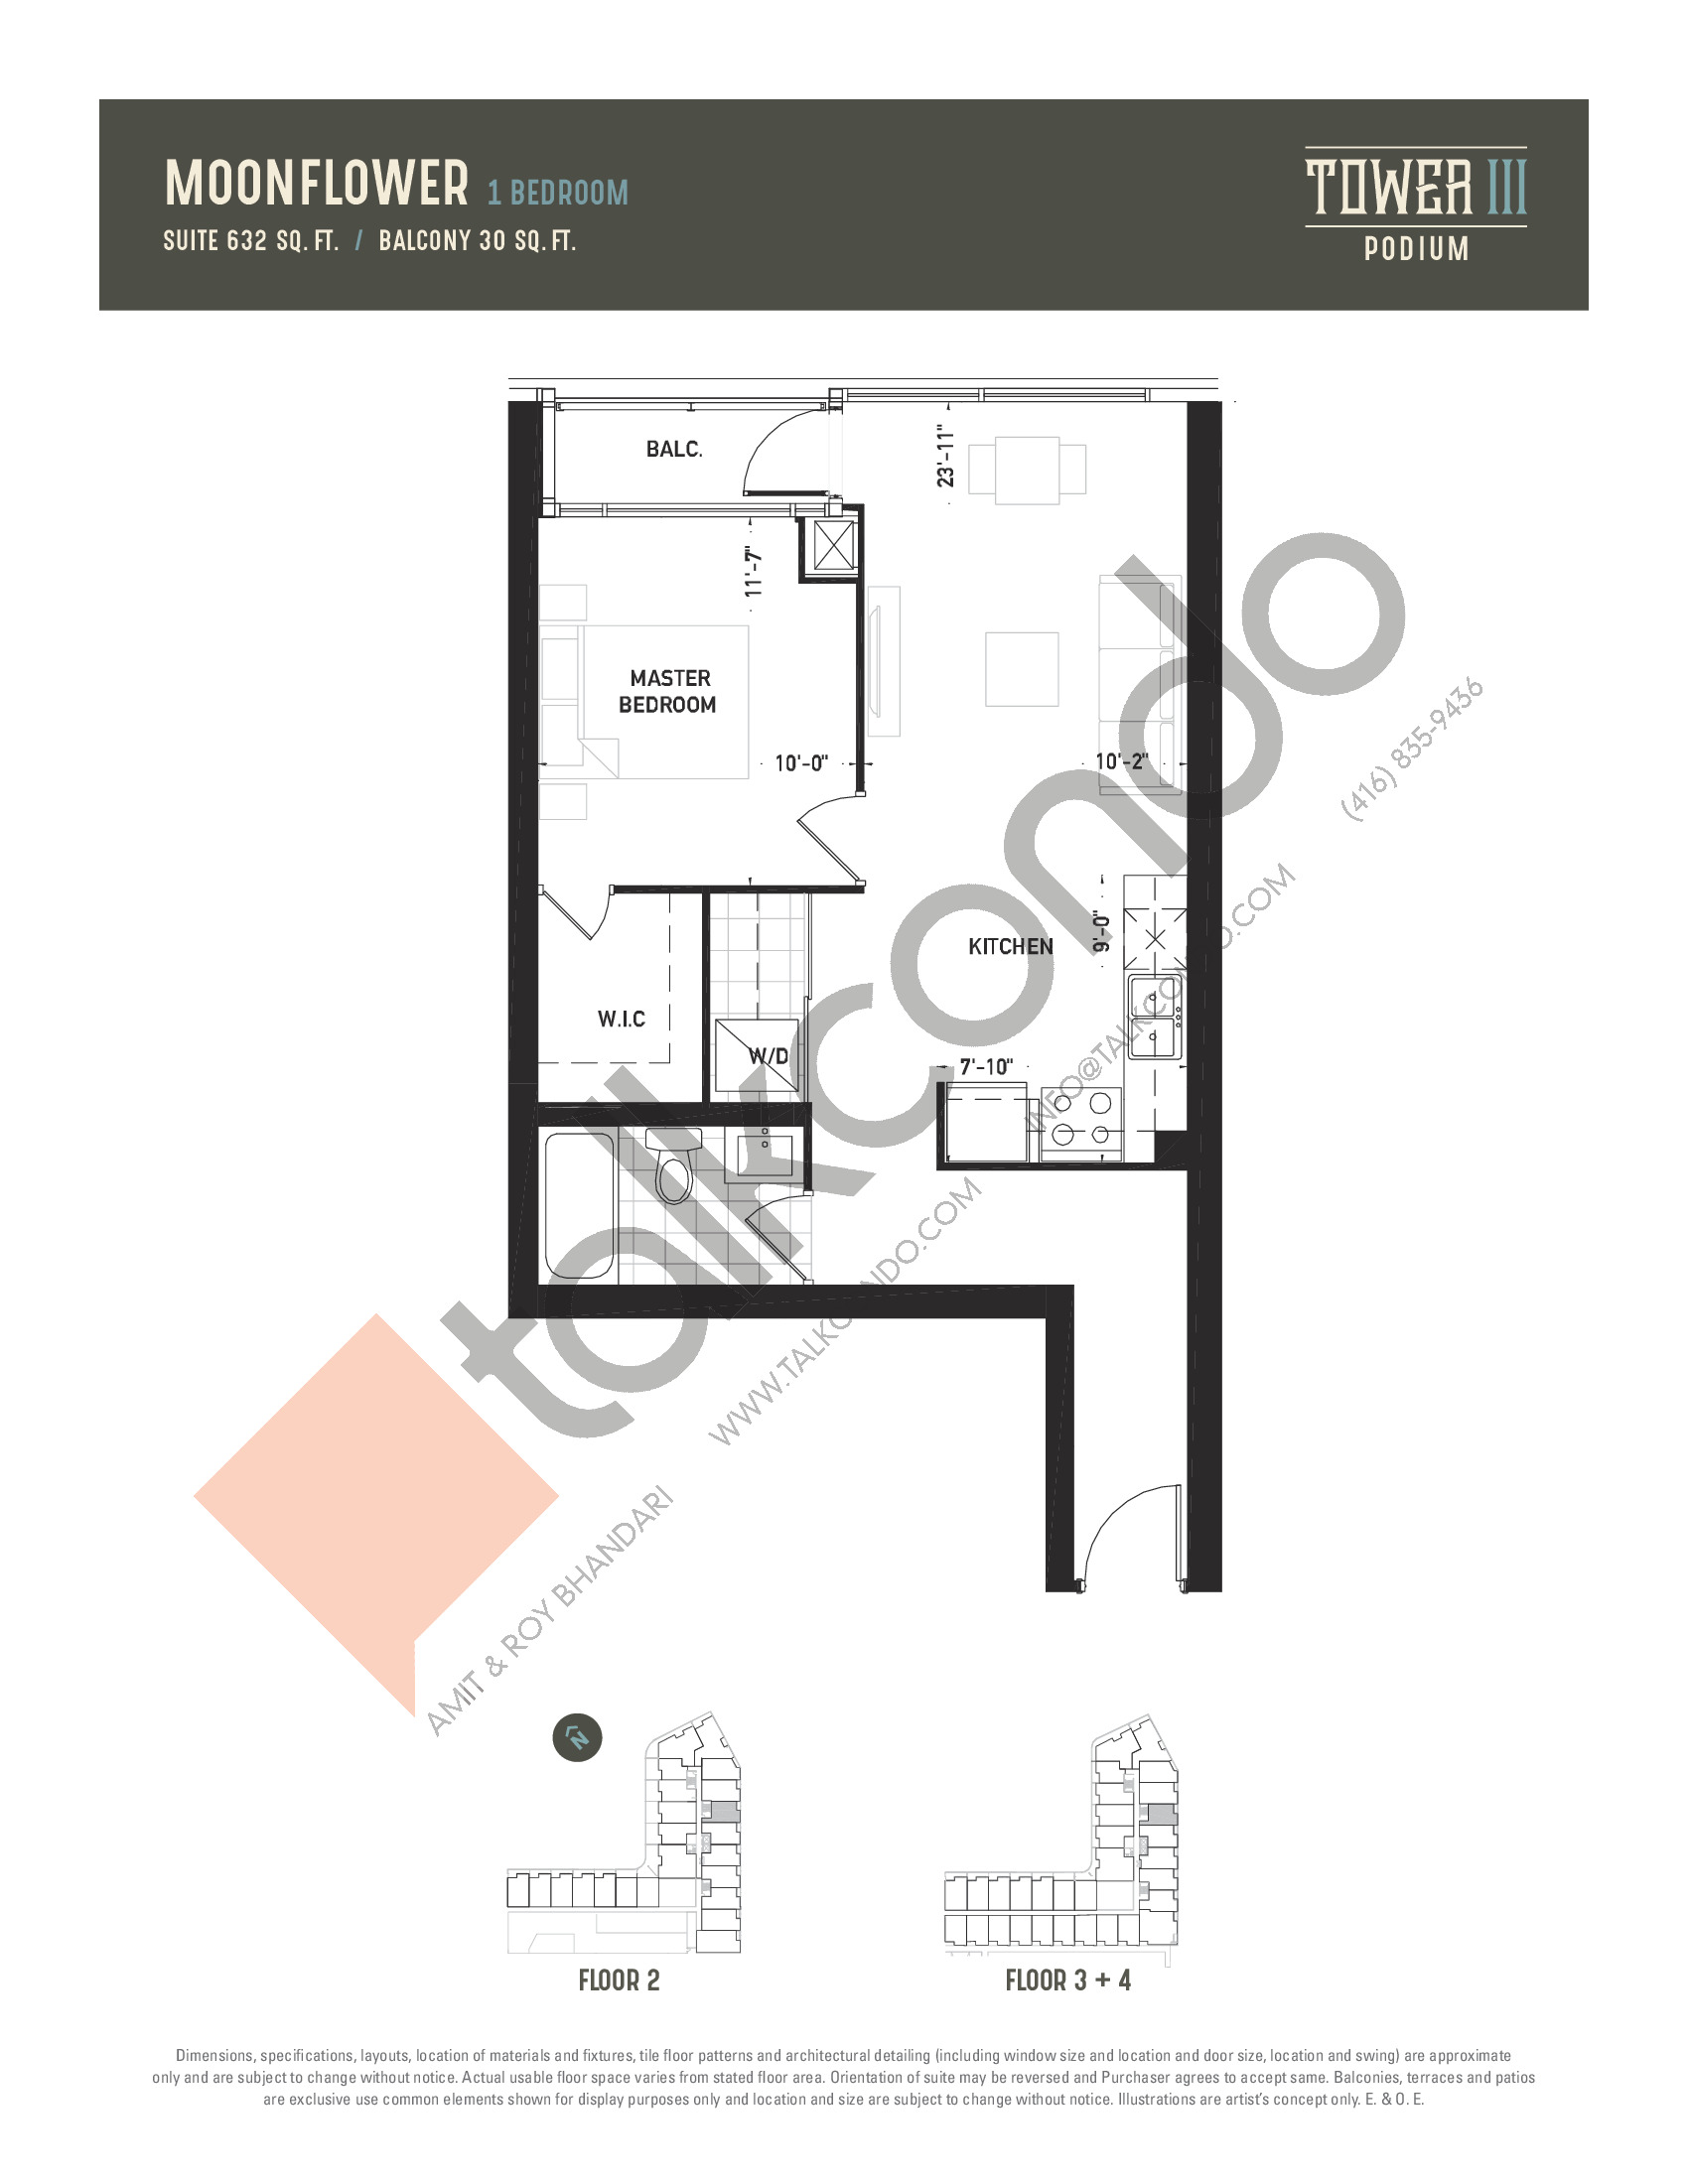 Moonflower Floor Plan at Oak & Co. 3 Condos - 632 sq.ft